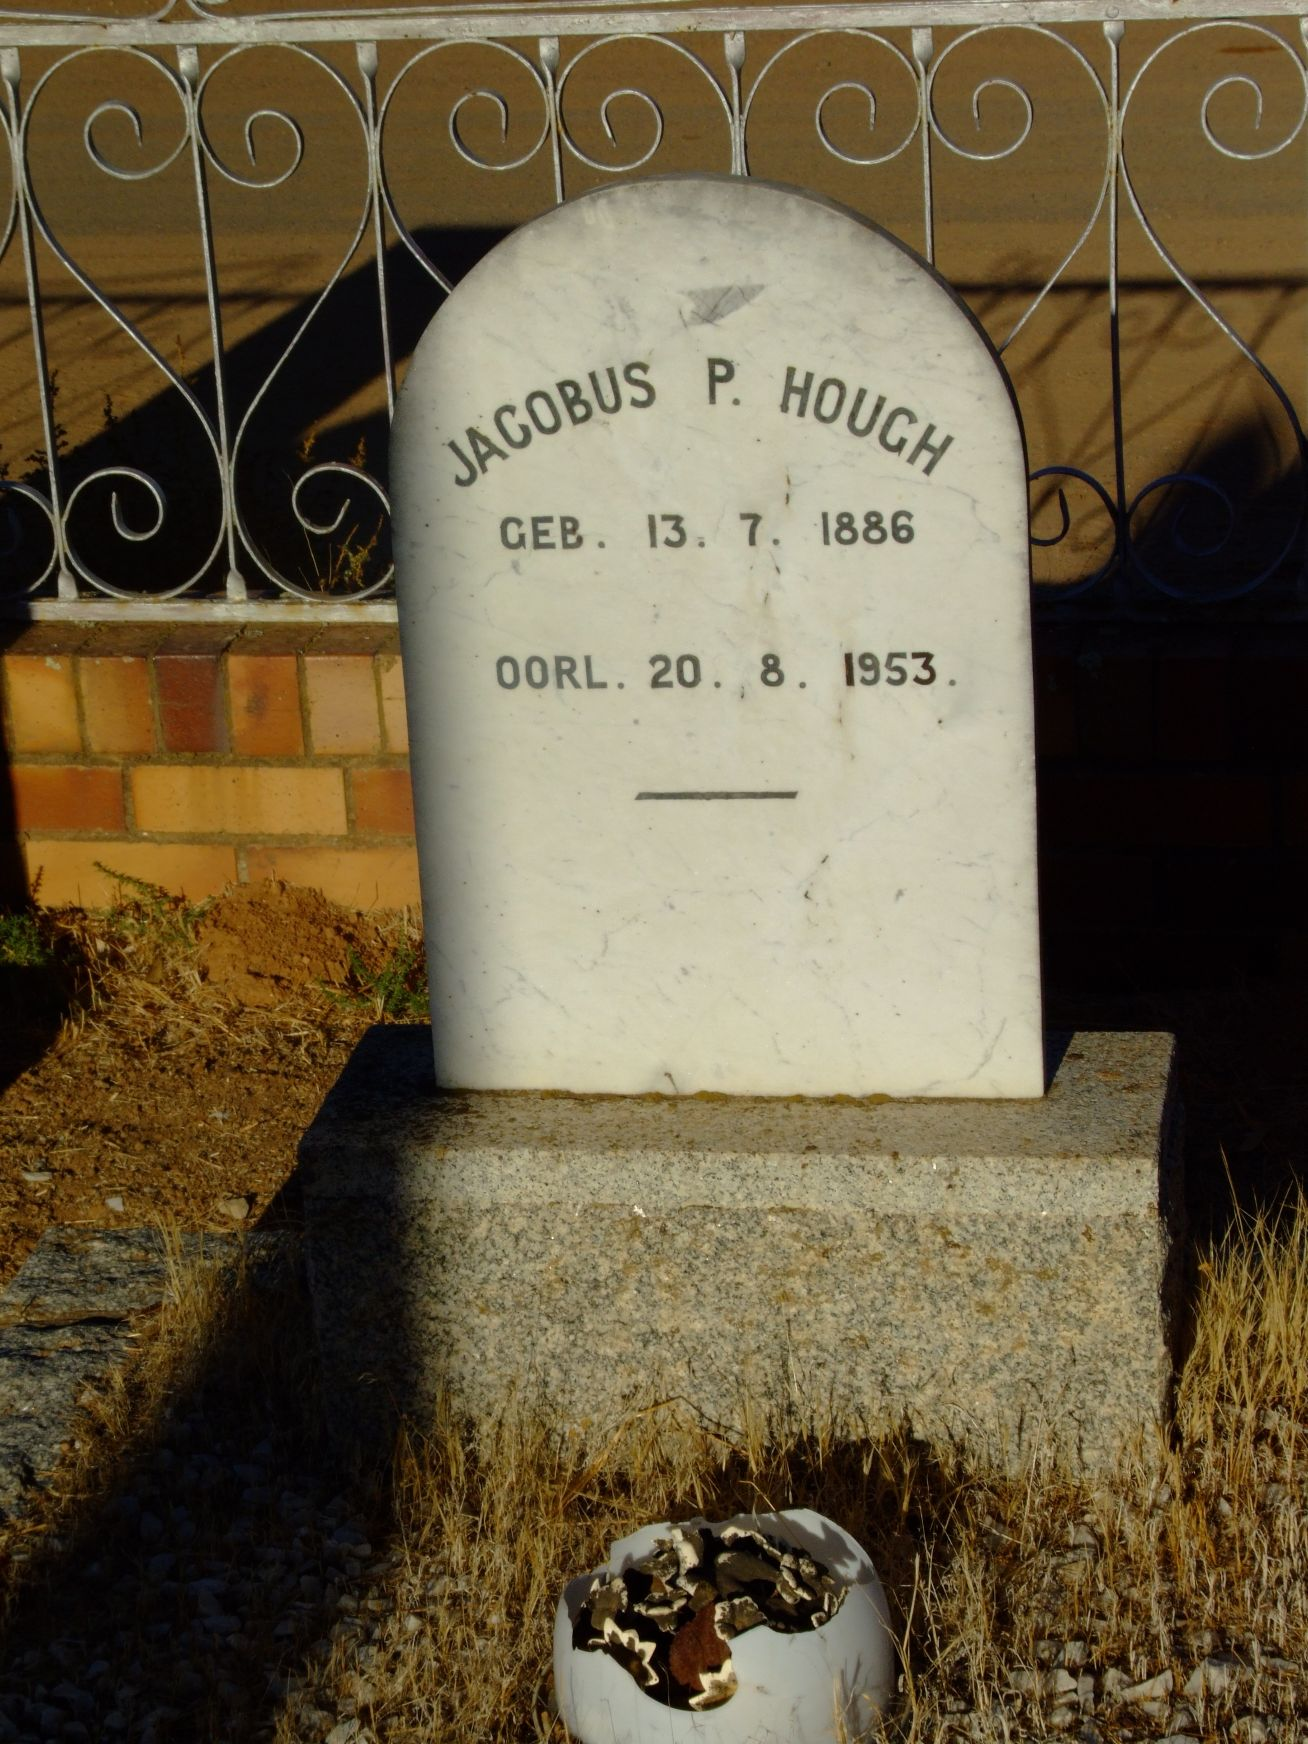 Hough Jacobus P